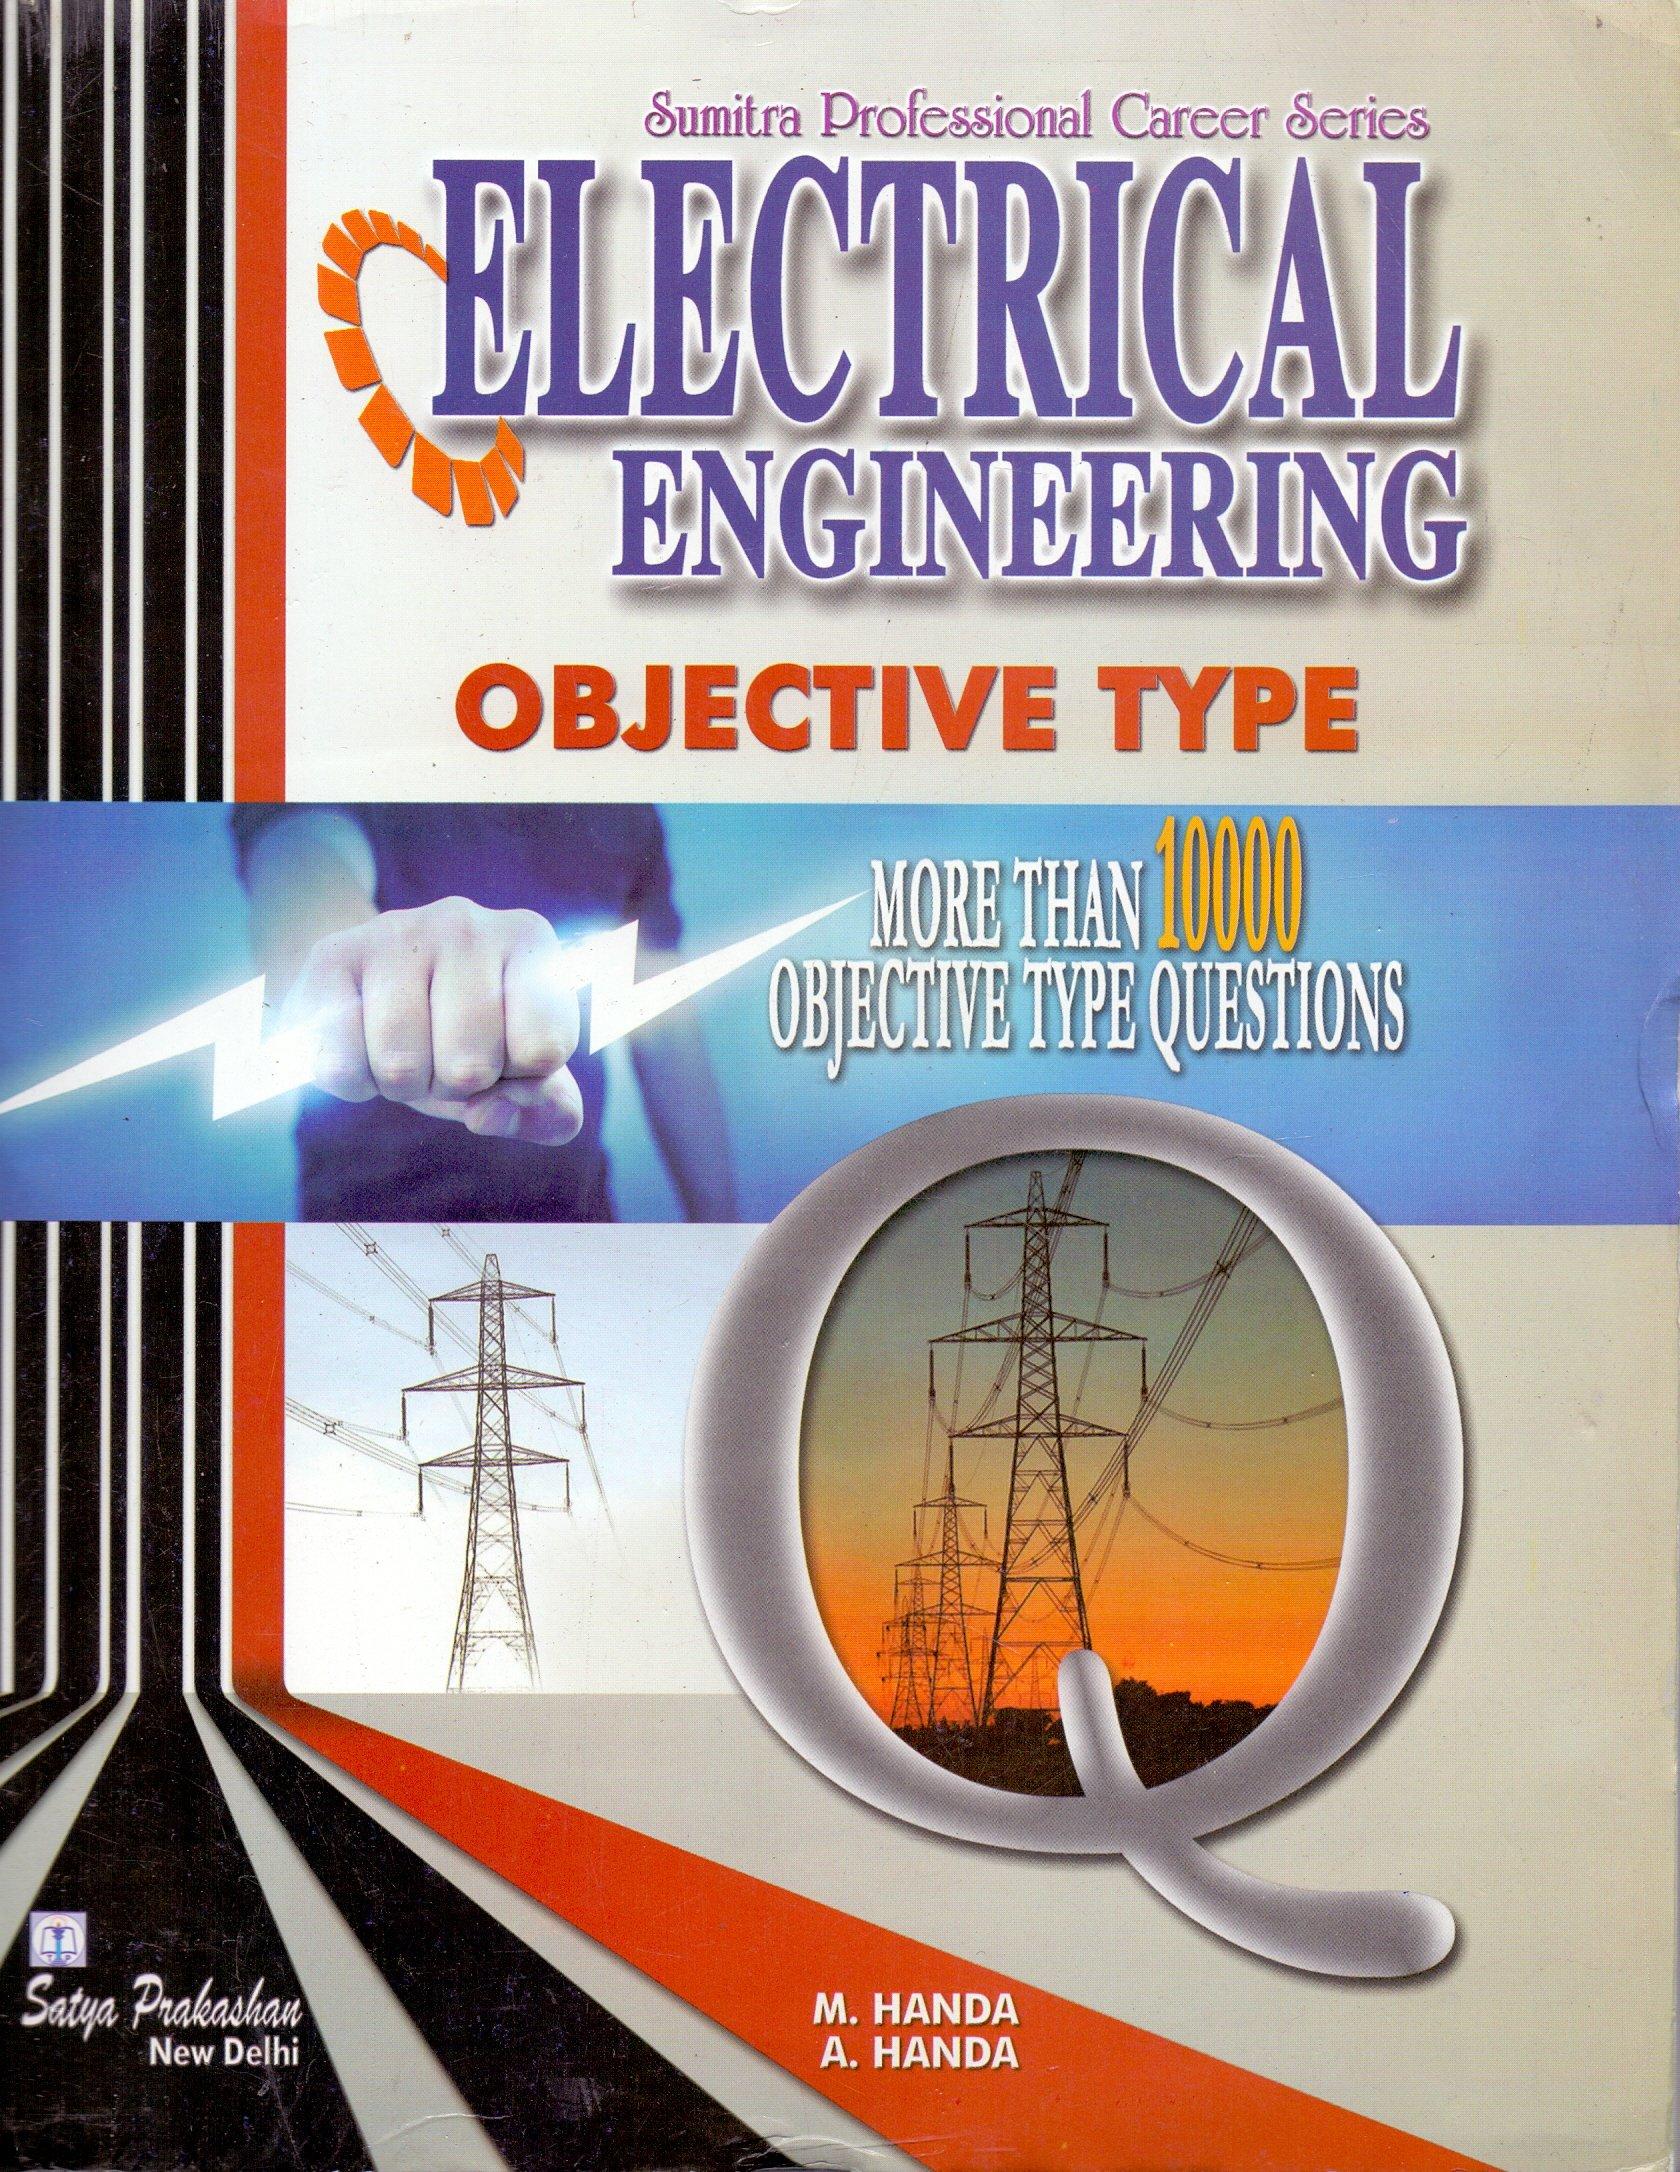 Electrical Engineering Objective Type By A.Handa, M.Handa